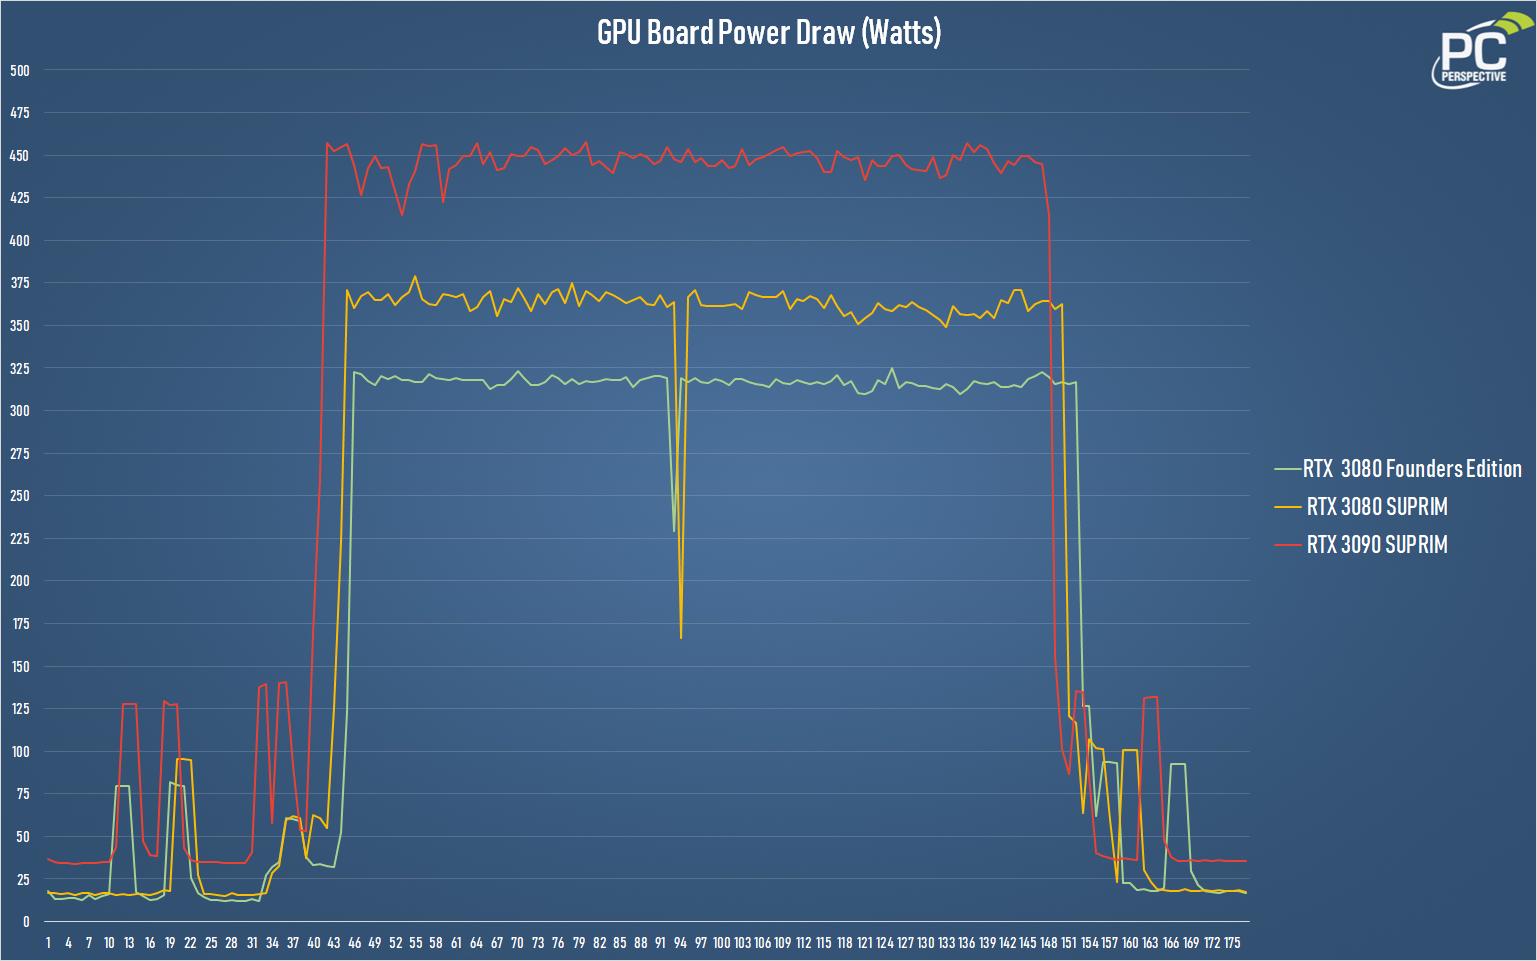 MSI RTX 3080 3090 SUPRIM Board Power Draw Chart